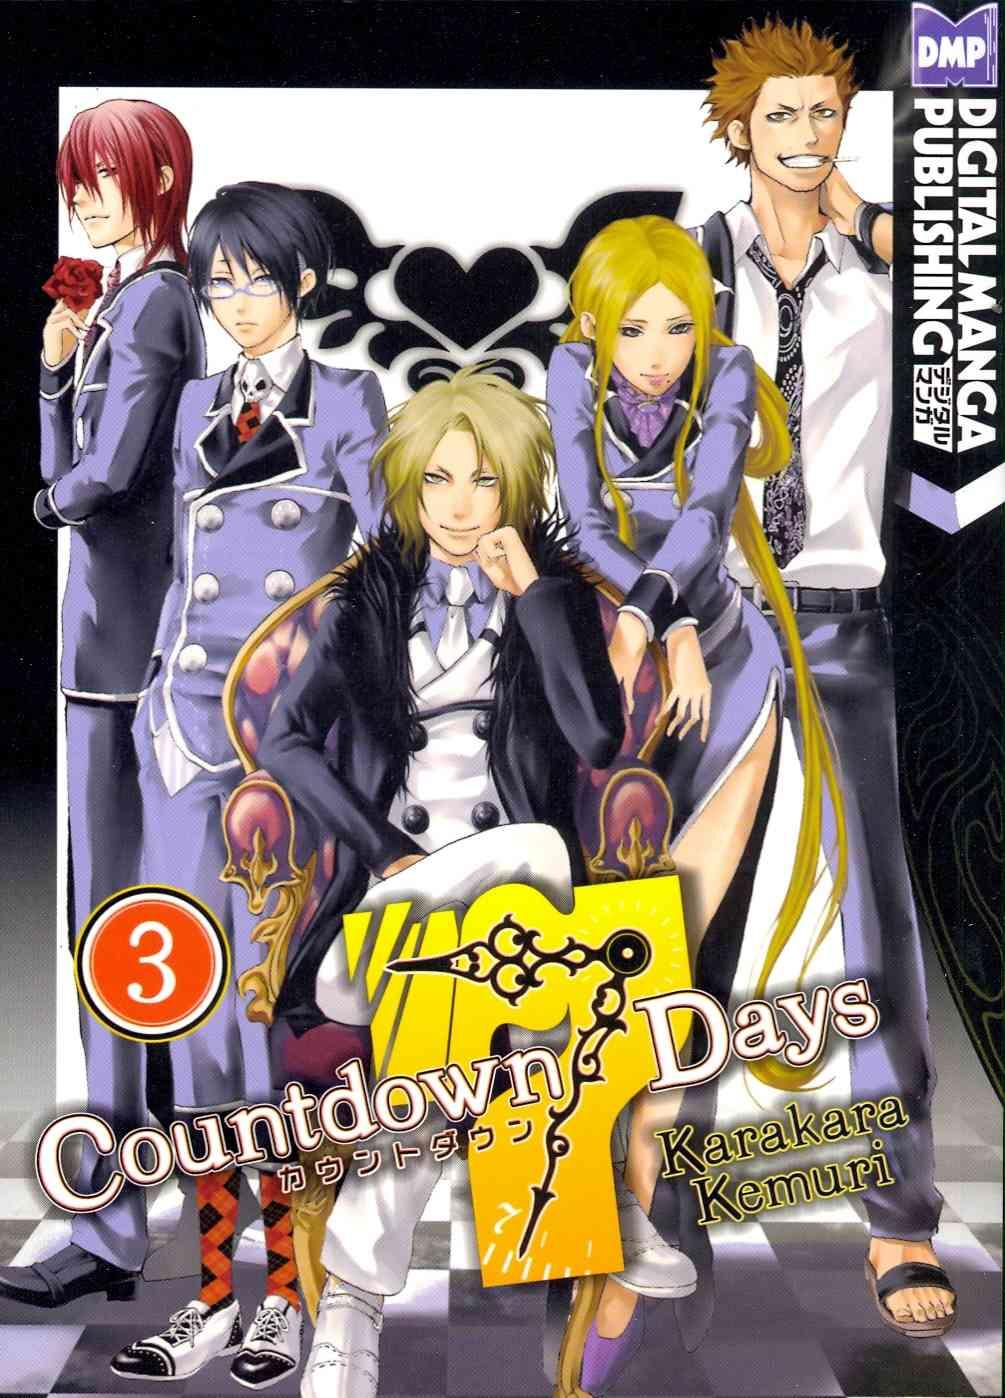 Countdown 7 Days 3 (Paperback)